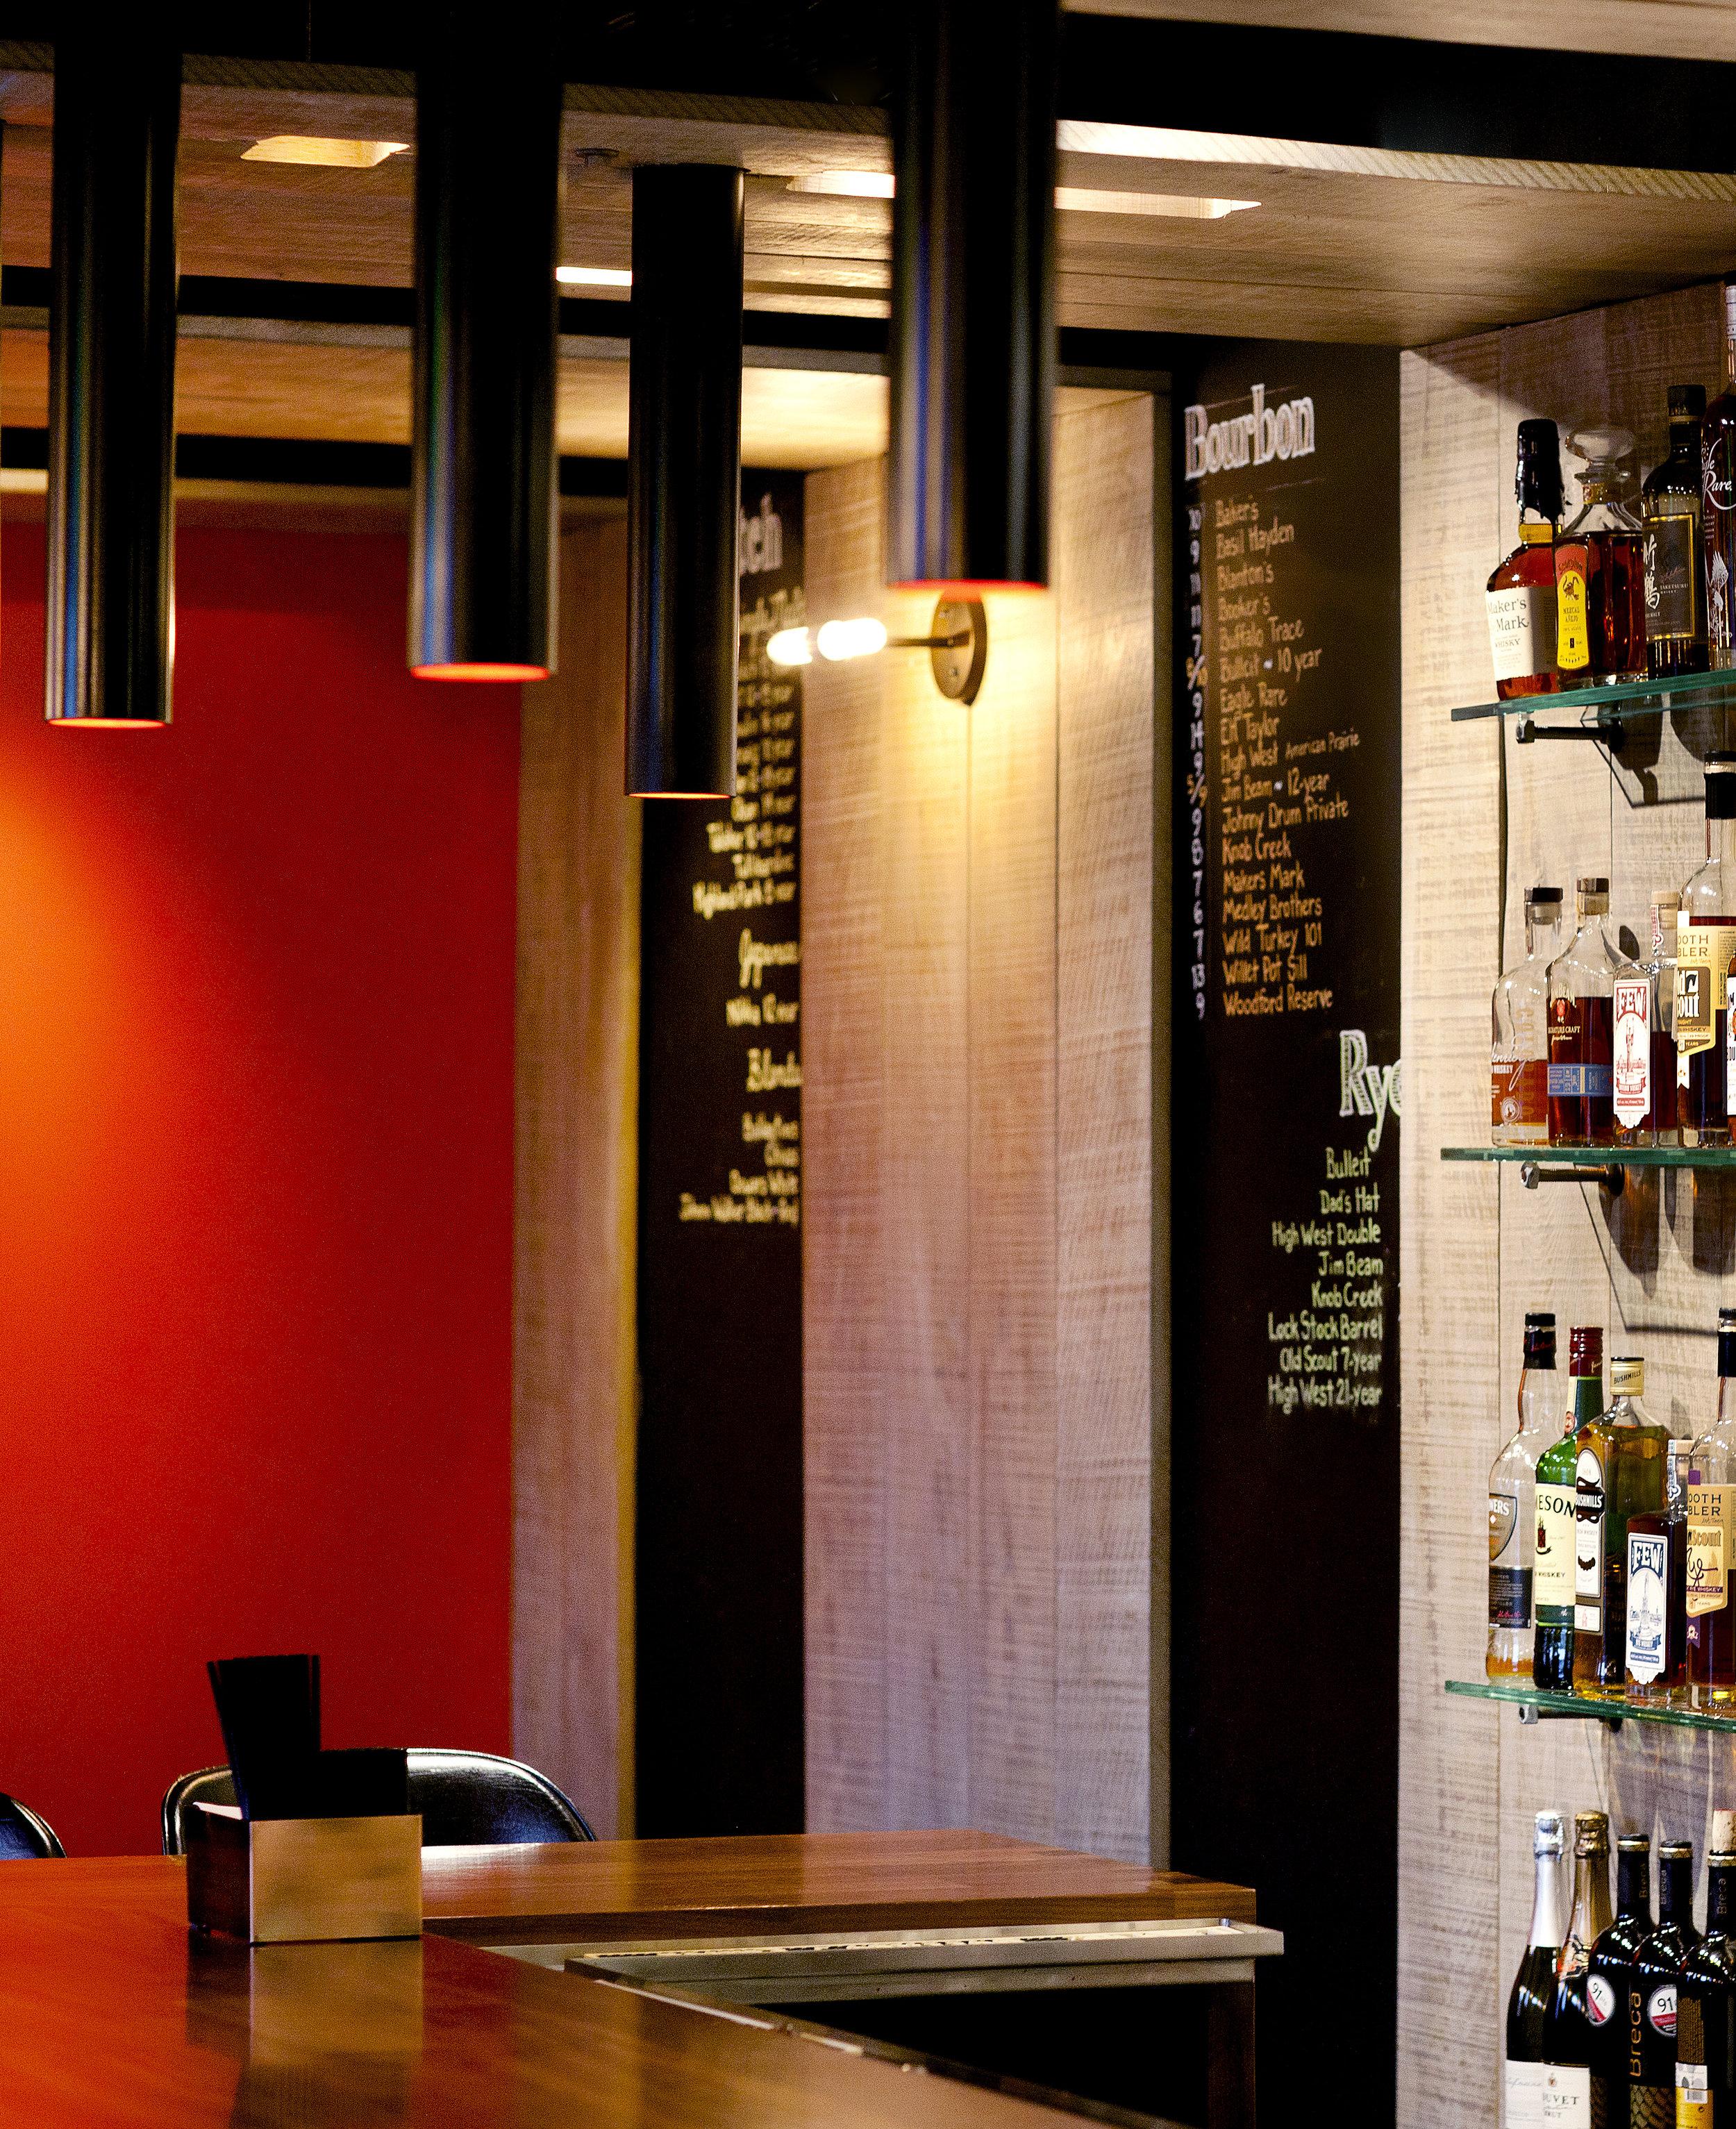 IMAGE 04 - 1157 Bar + Kitchen.jpg